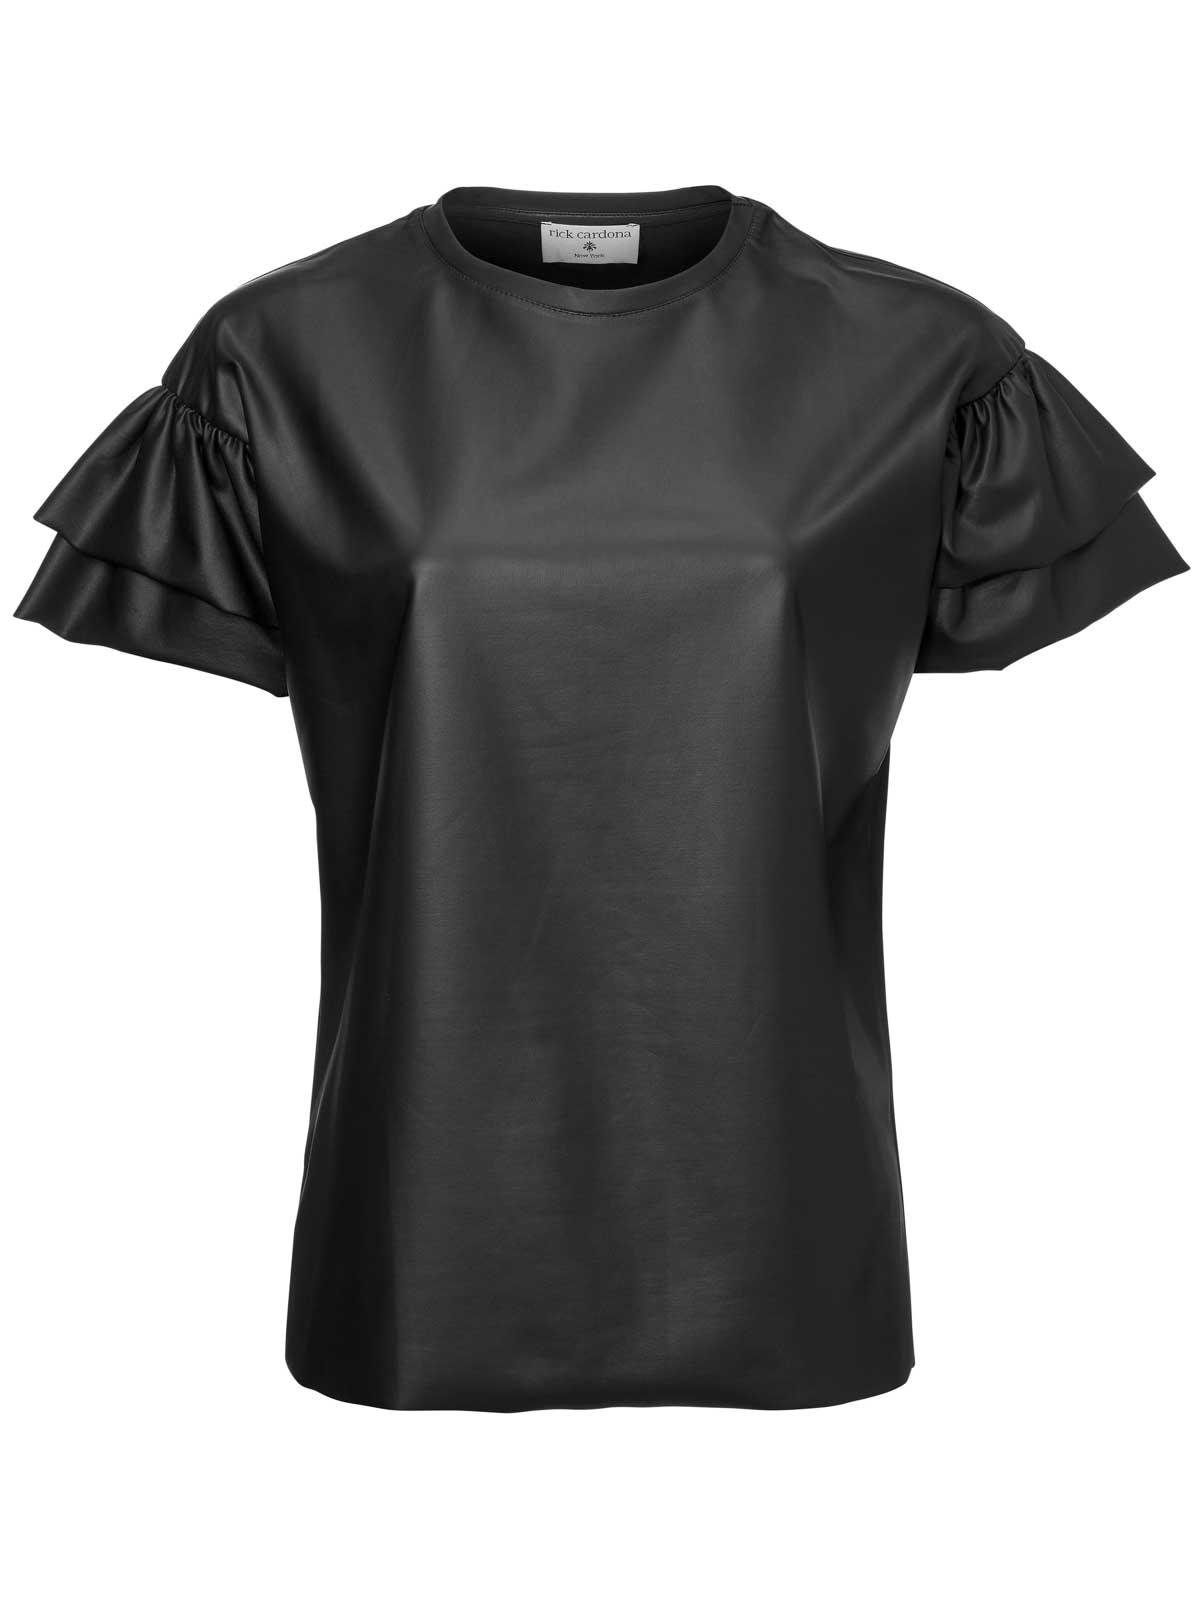 054.085 RICK CARDONA Damen Designer-Lederimitat-Shirt Schwarz